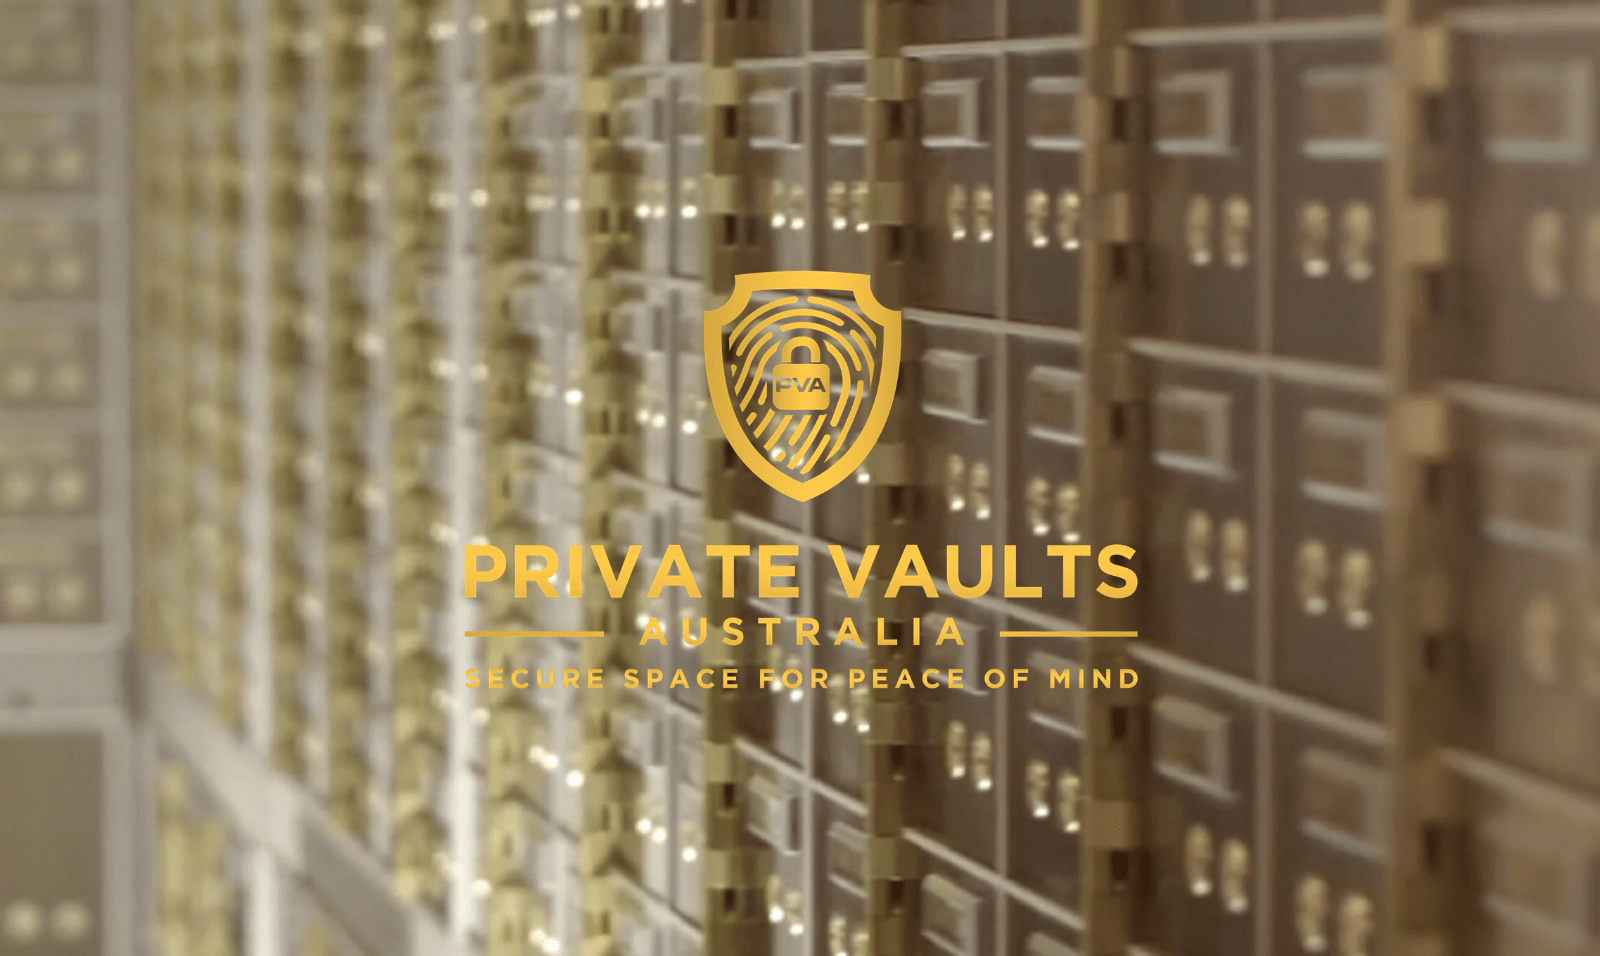 Private Vaults Australia